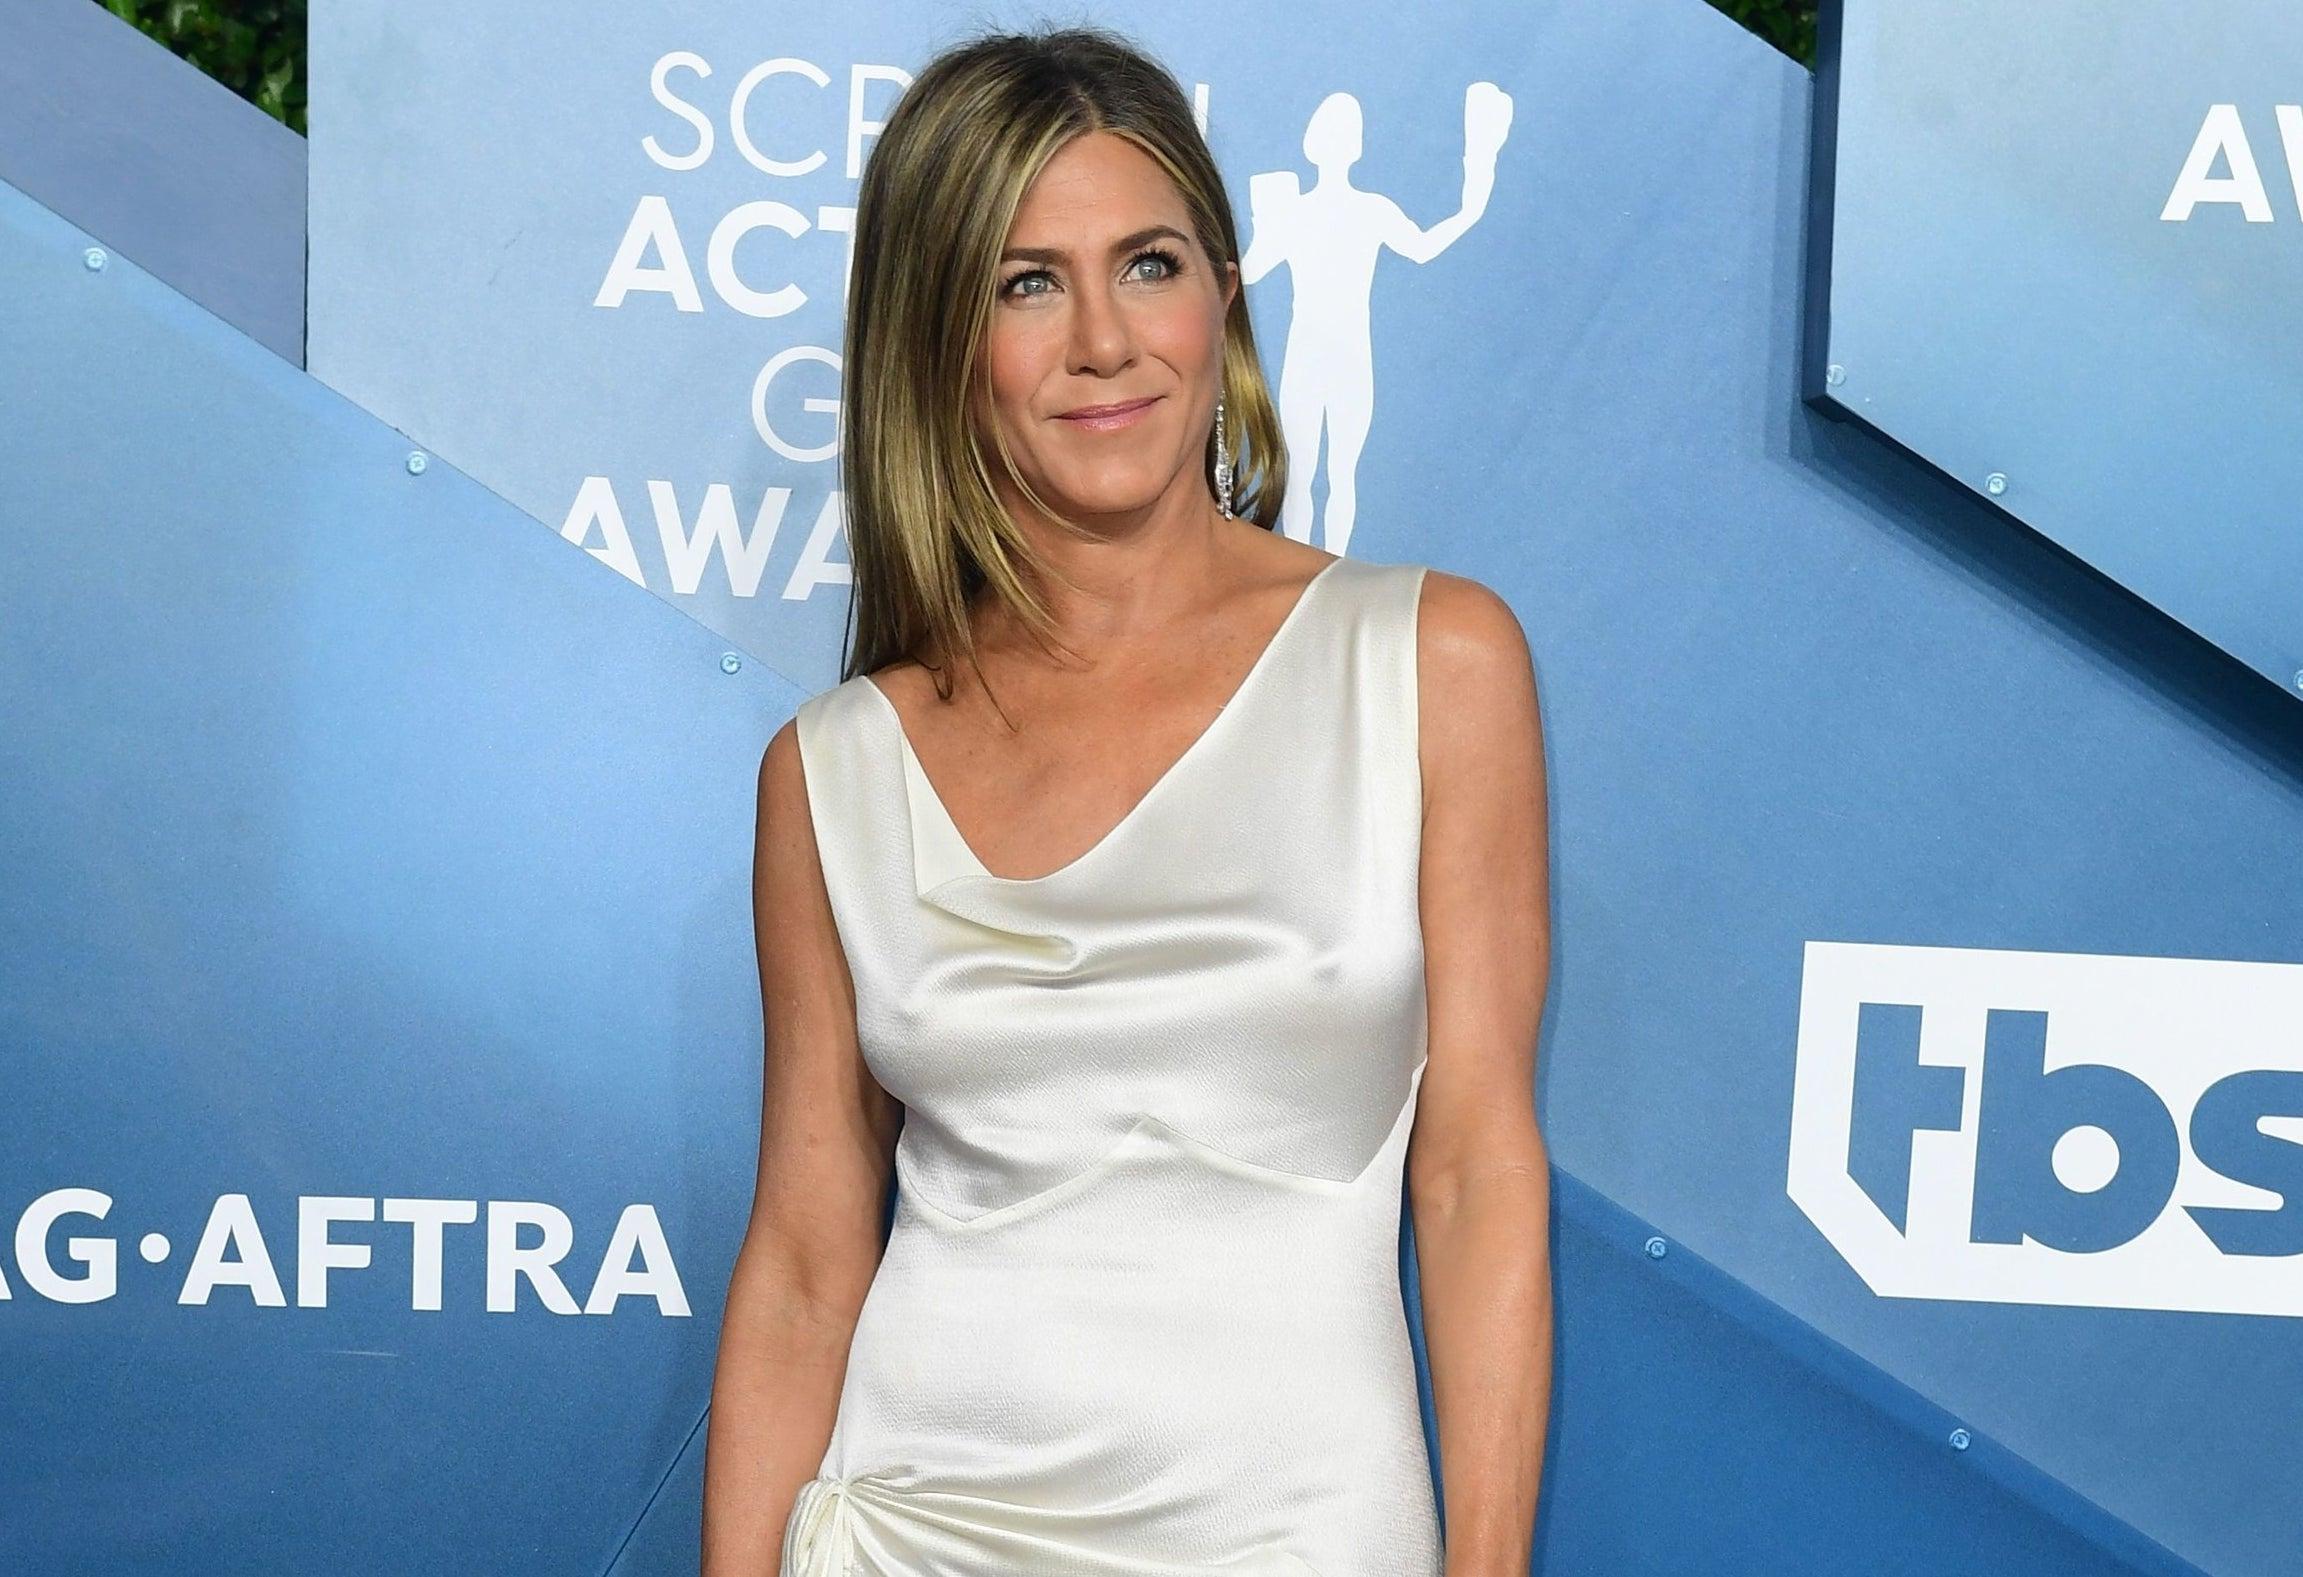 Jennifer Aniston poses on a red carpet